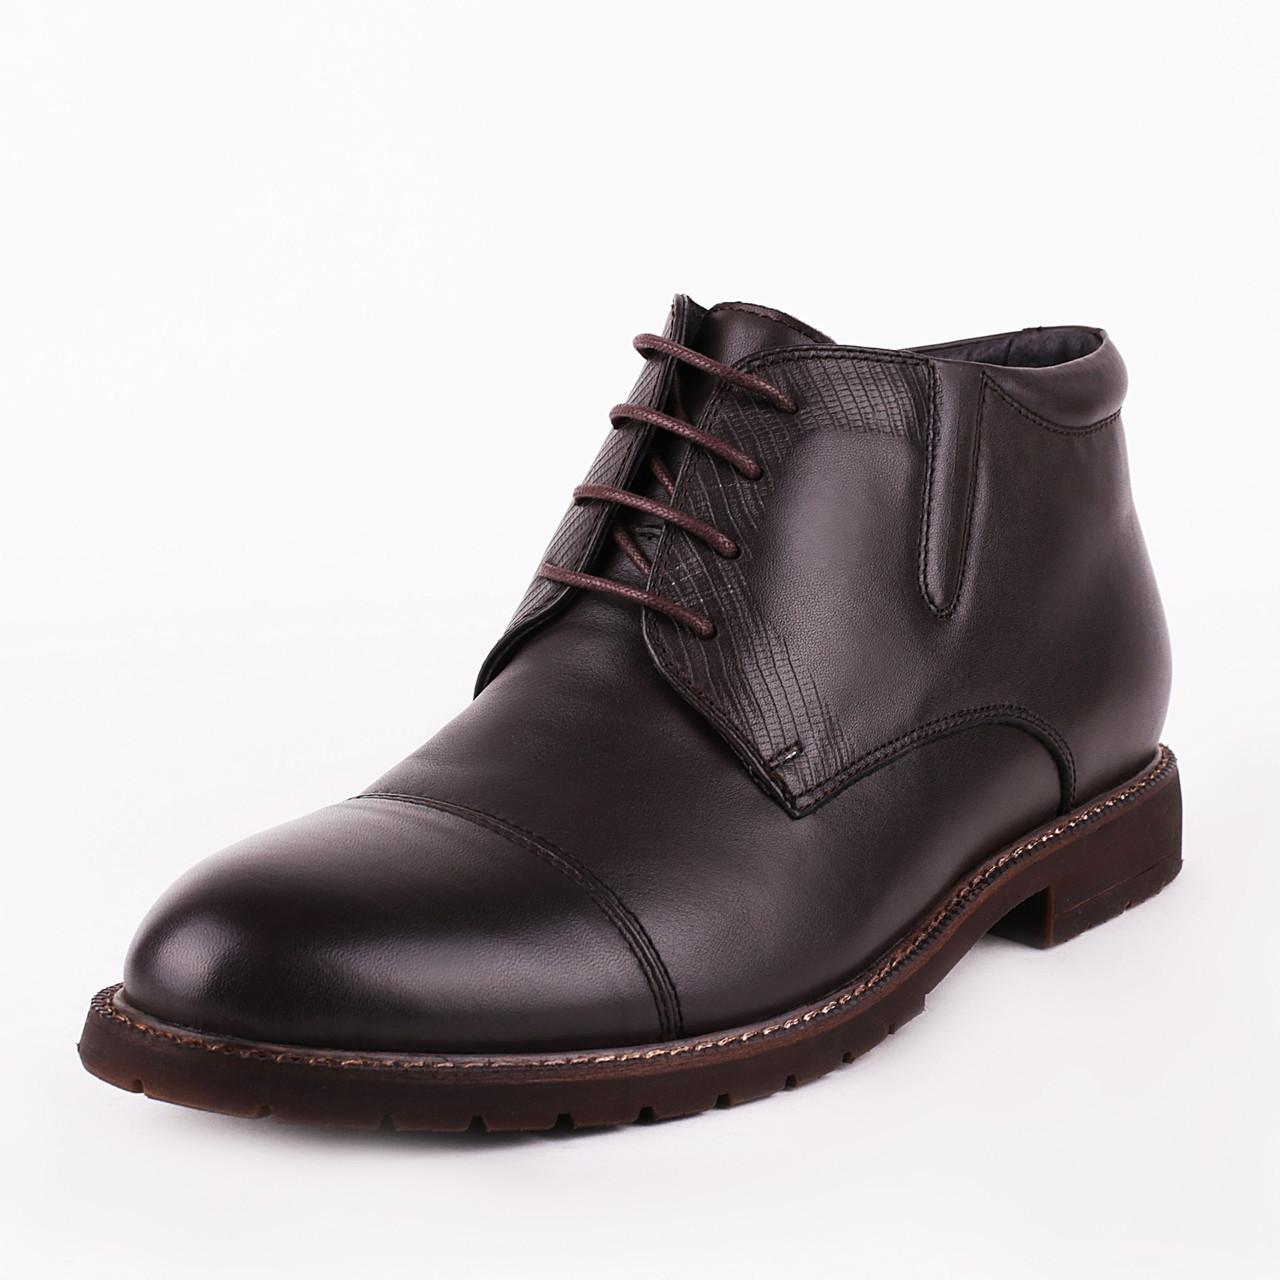 d29629e07 Мужские Ботинки Maklinit - Интернет-магазин обуви и одежды «VENTURA-SHOES»  ВЕНТУРА